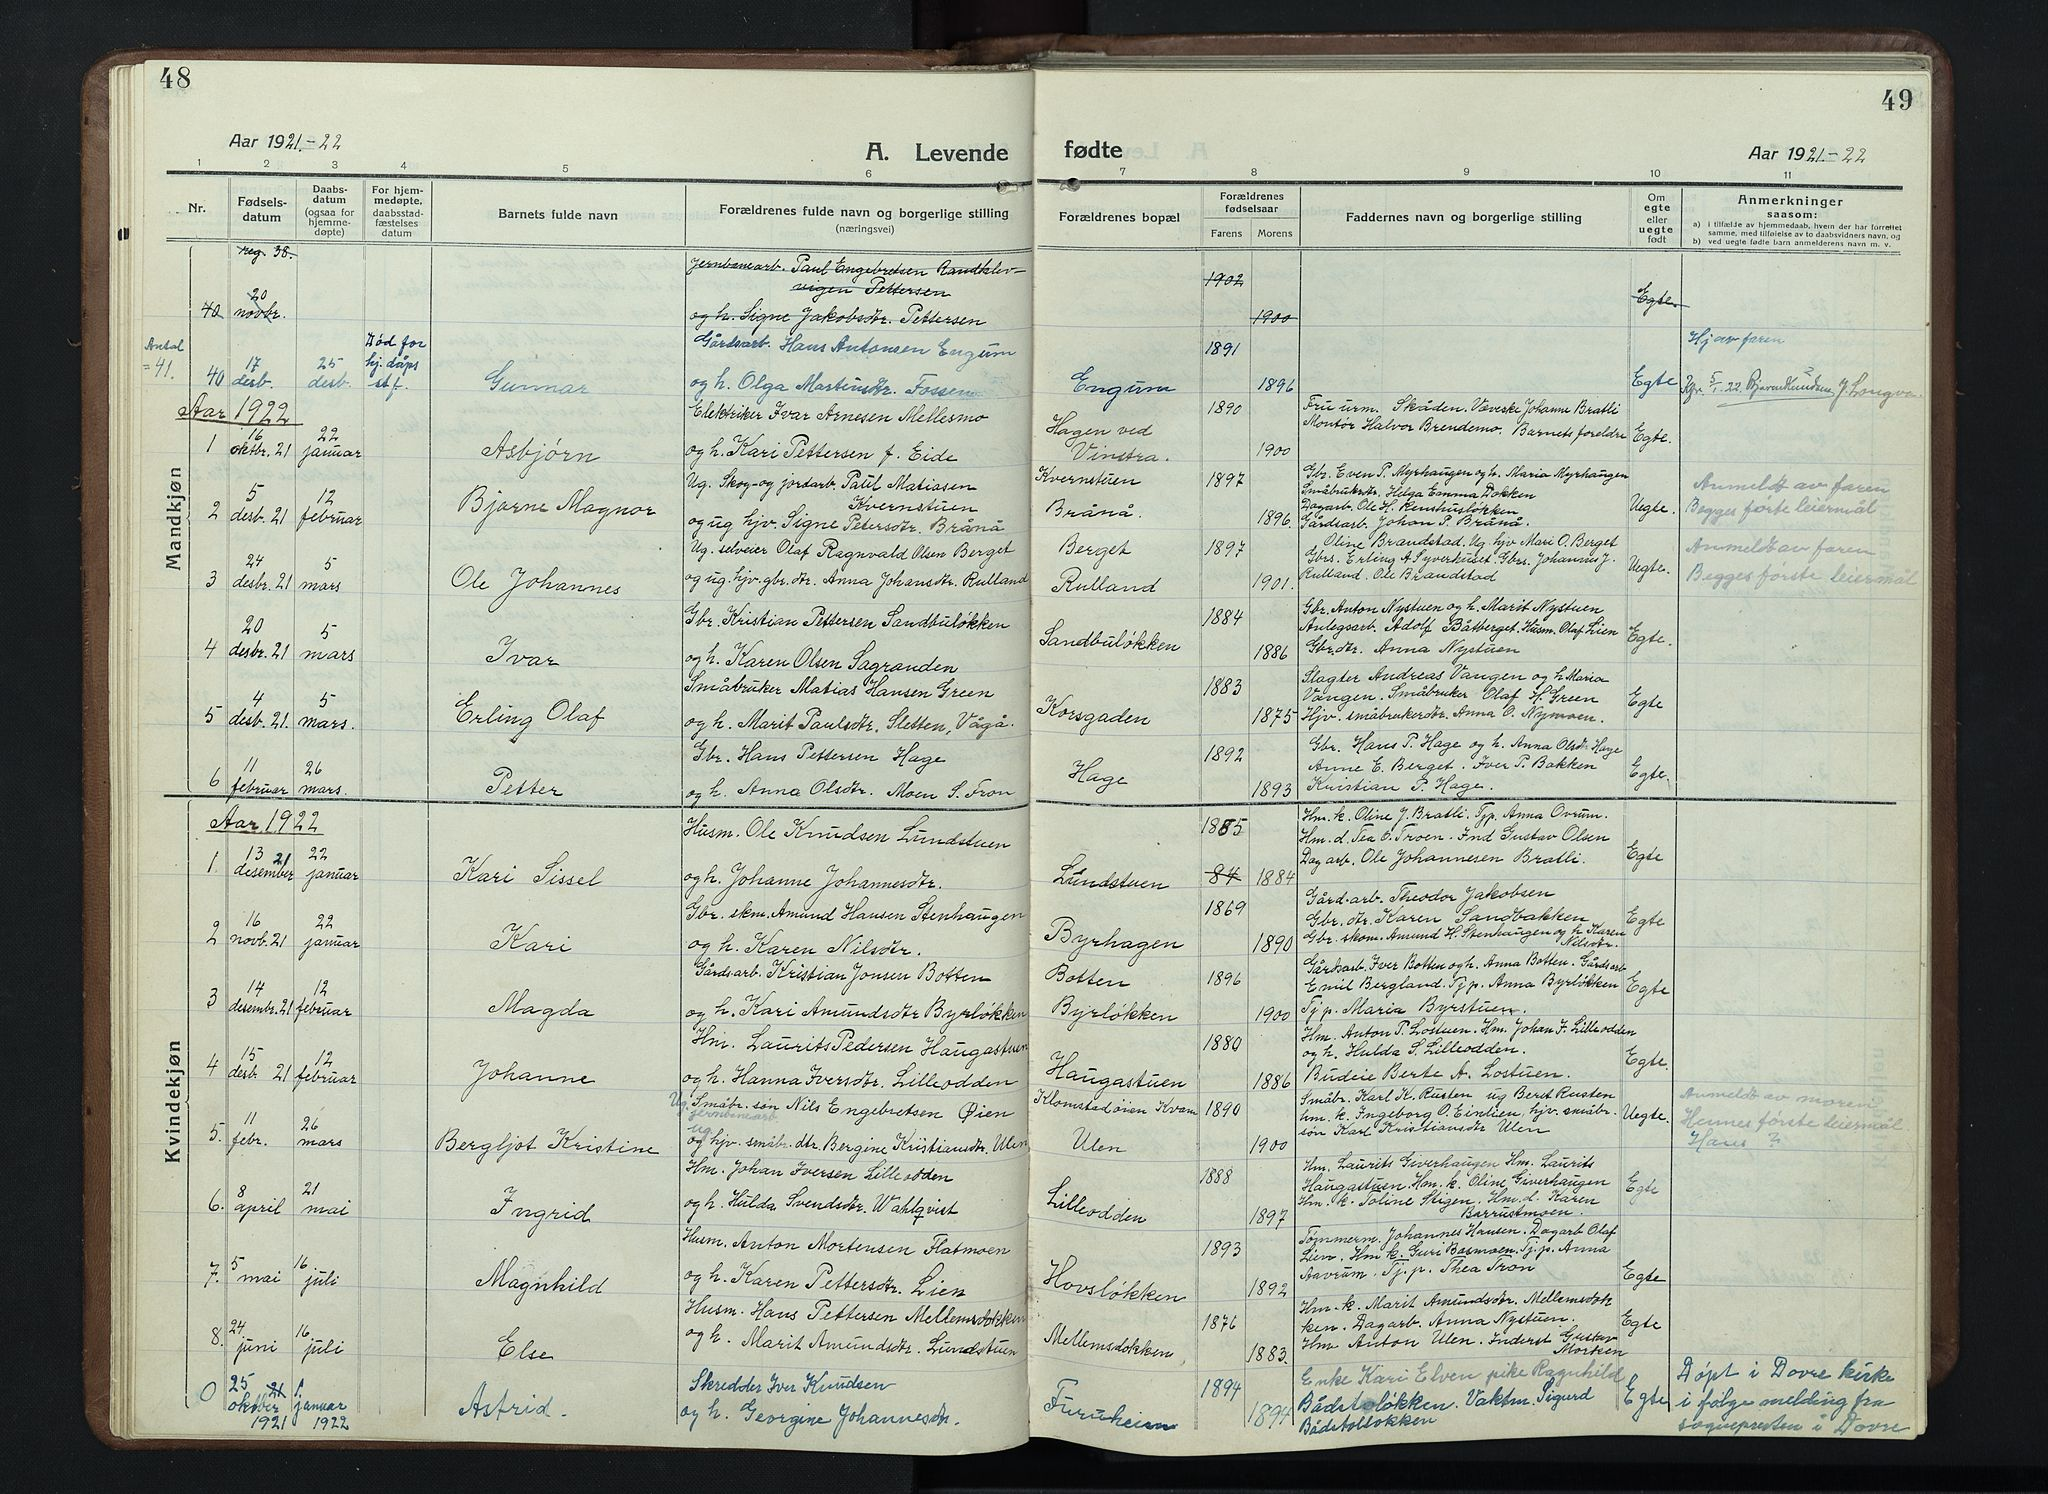 SAH, Nord-Fron prestekontor, Klokkerbok nr. 7, 1915-1946, s. 48-49